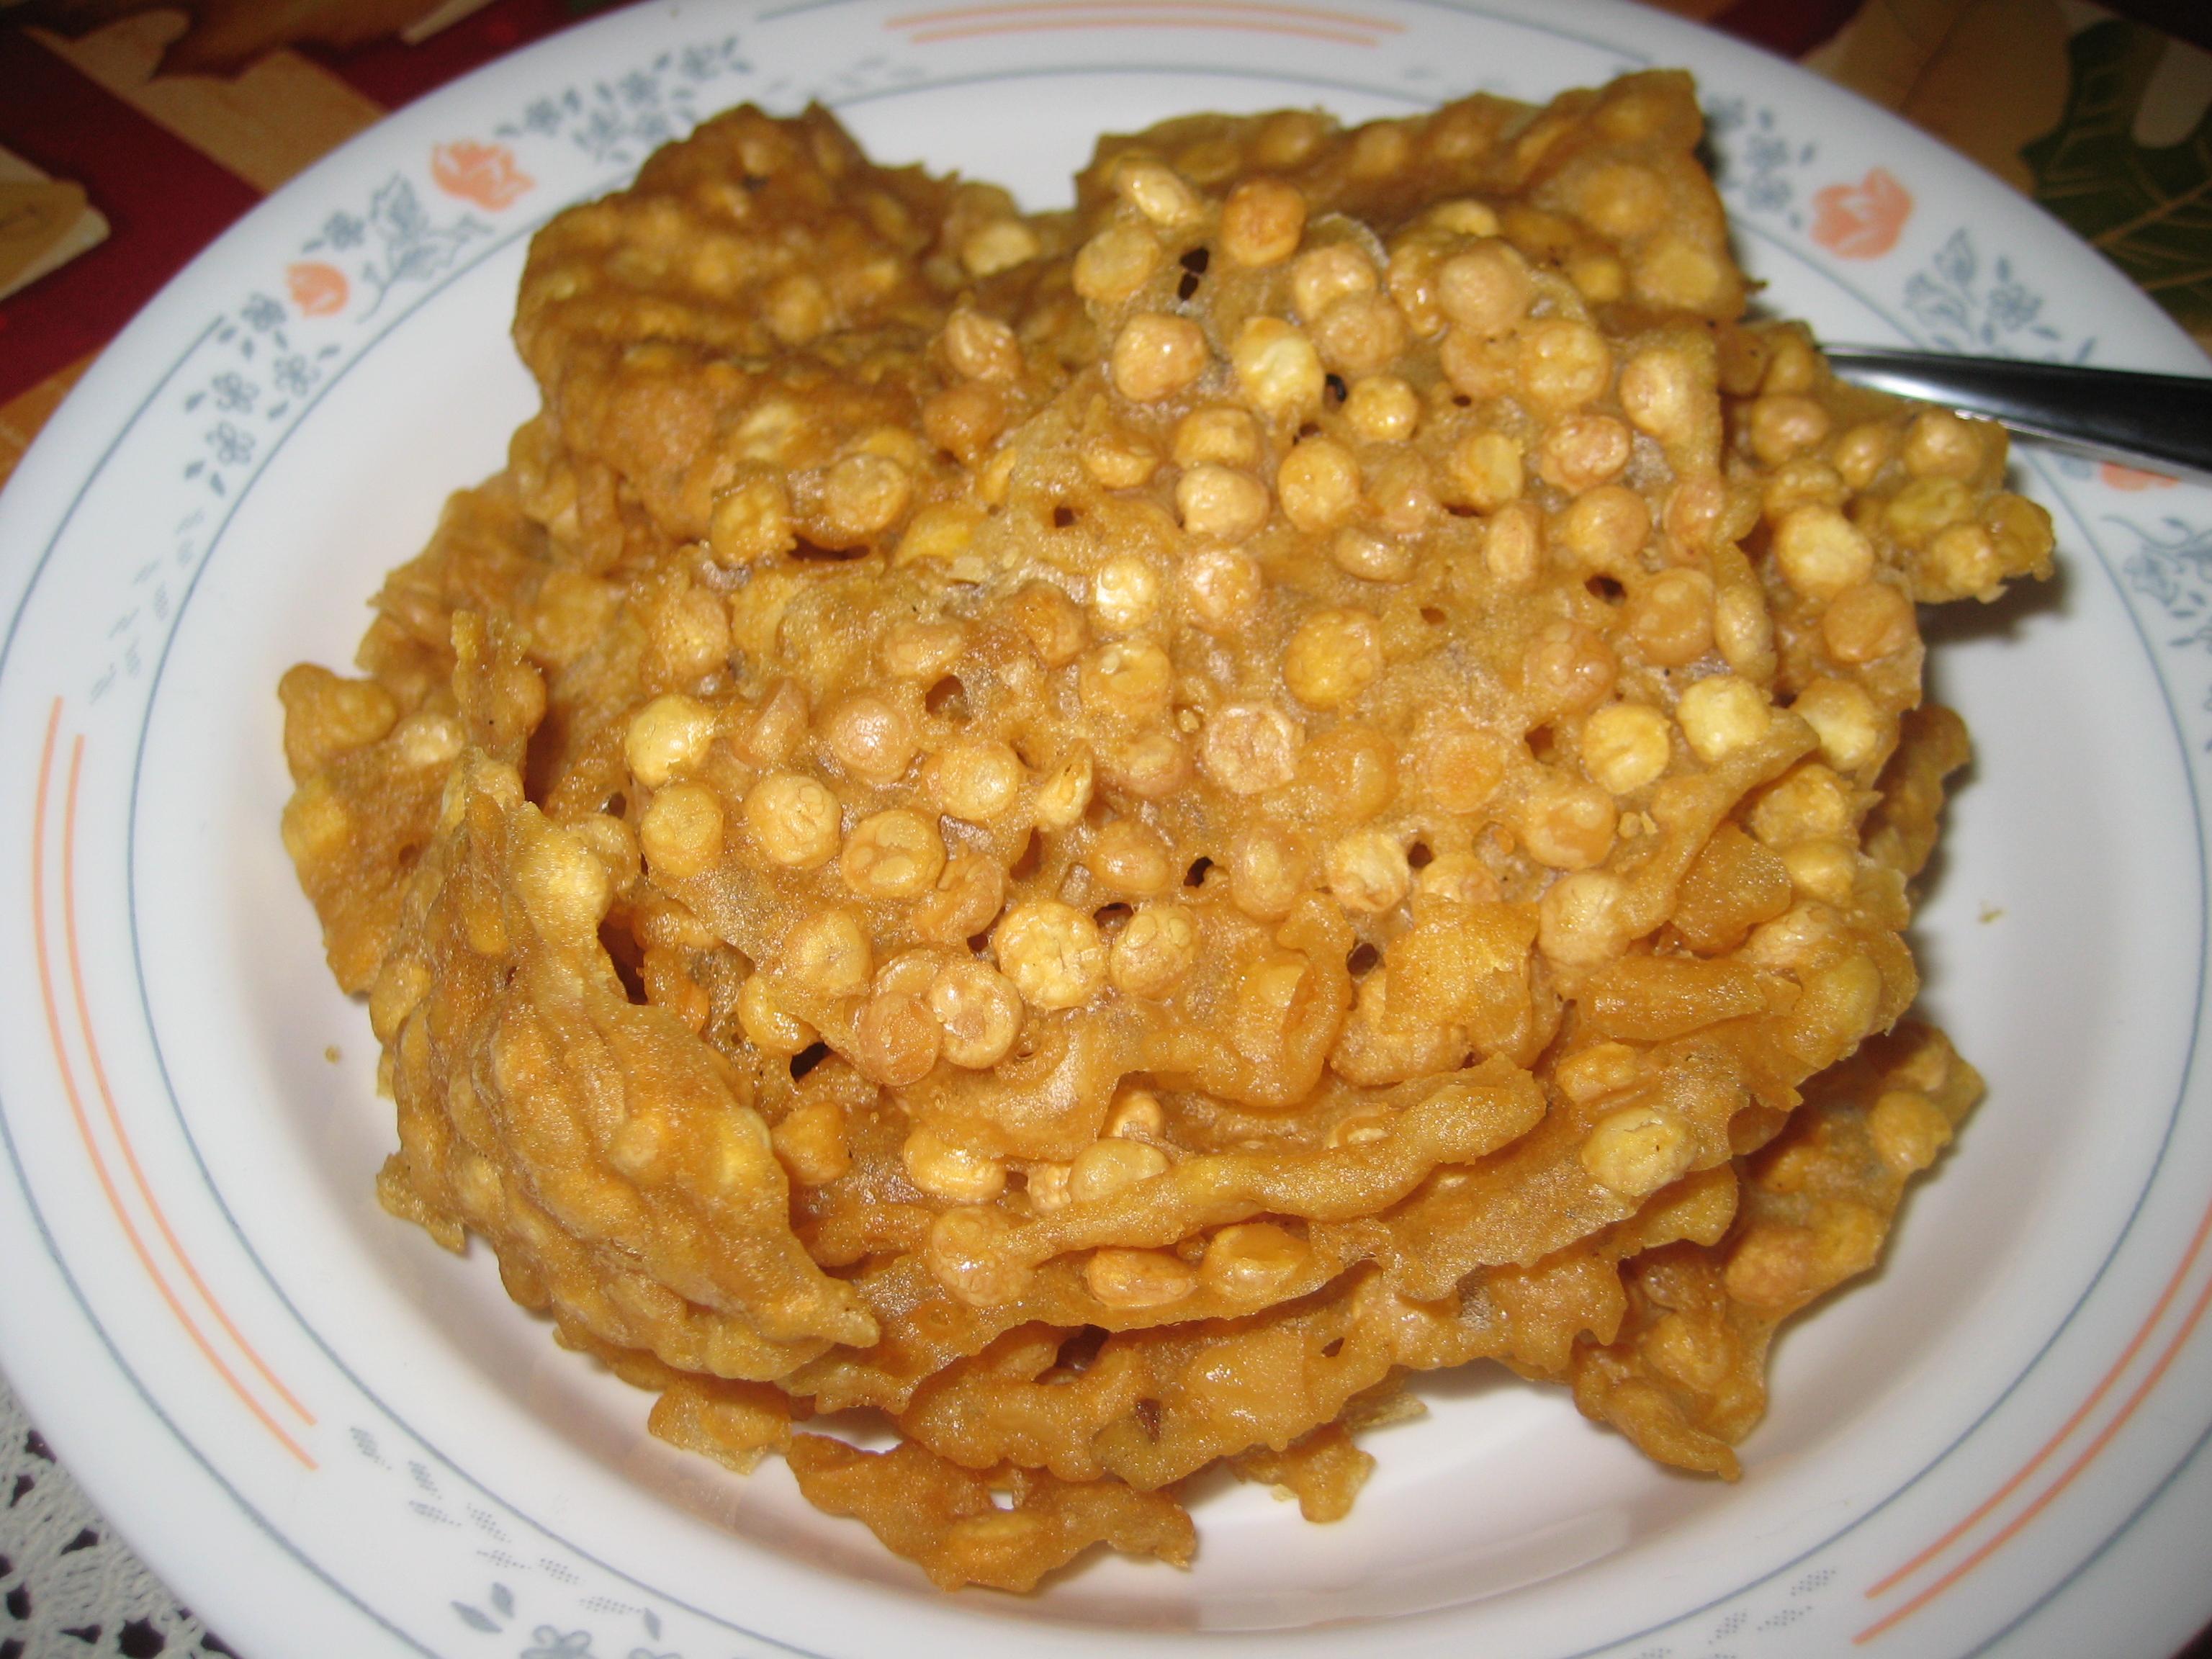 Gormandize: Vegan Ohn No Khao Swe (Burmese Noodles) with Chickpea Tofu